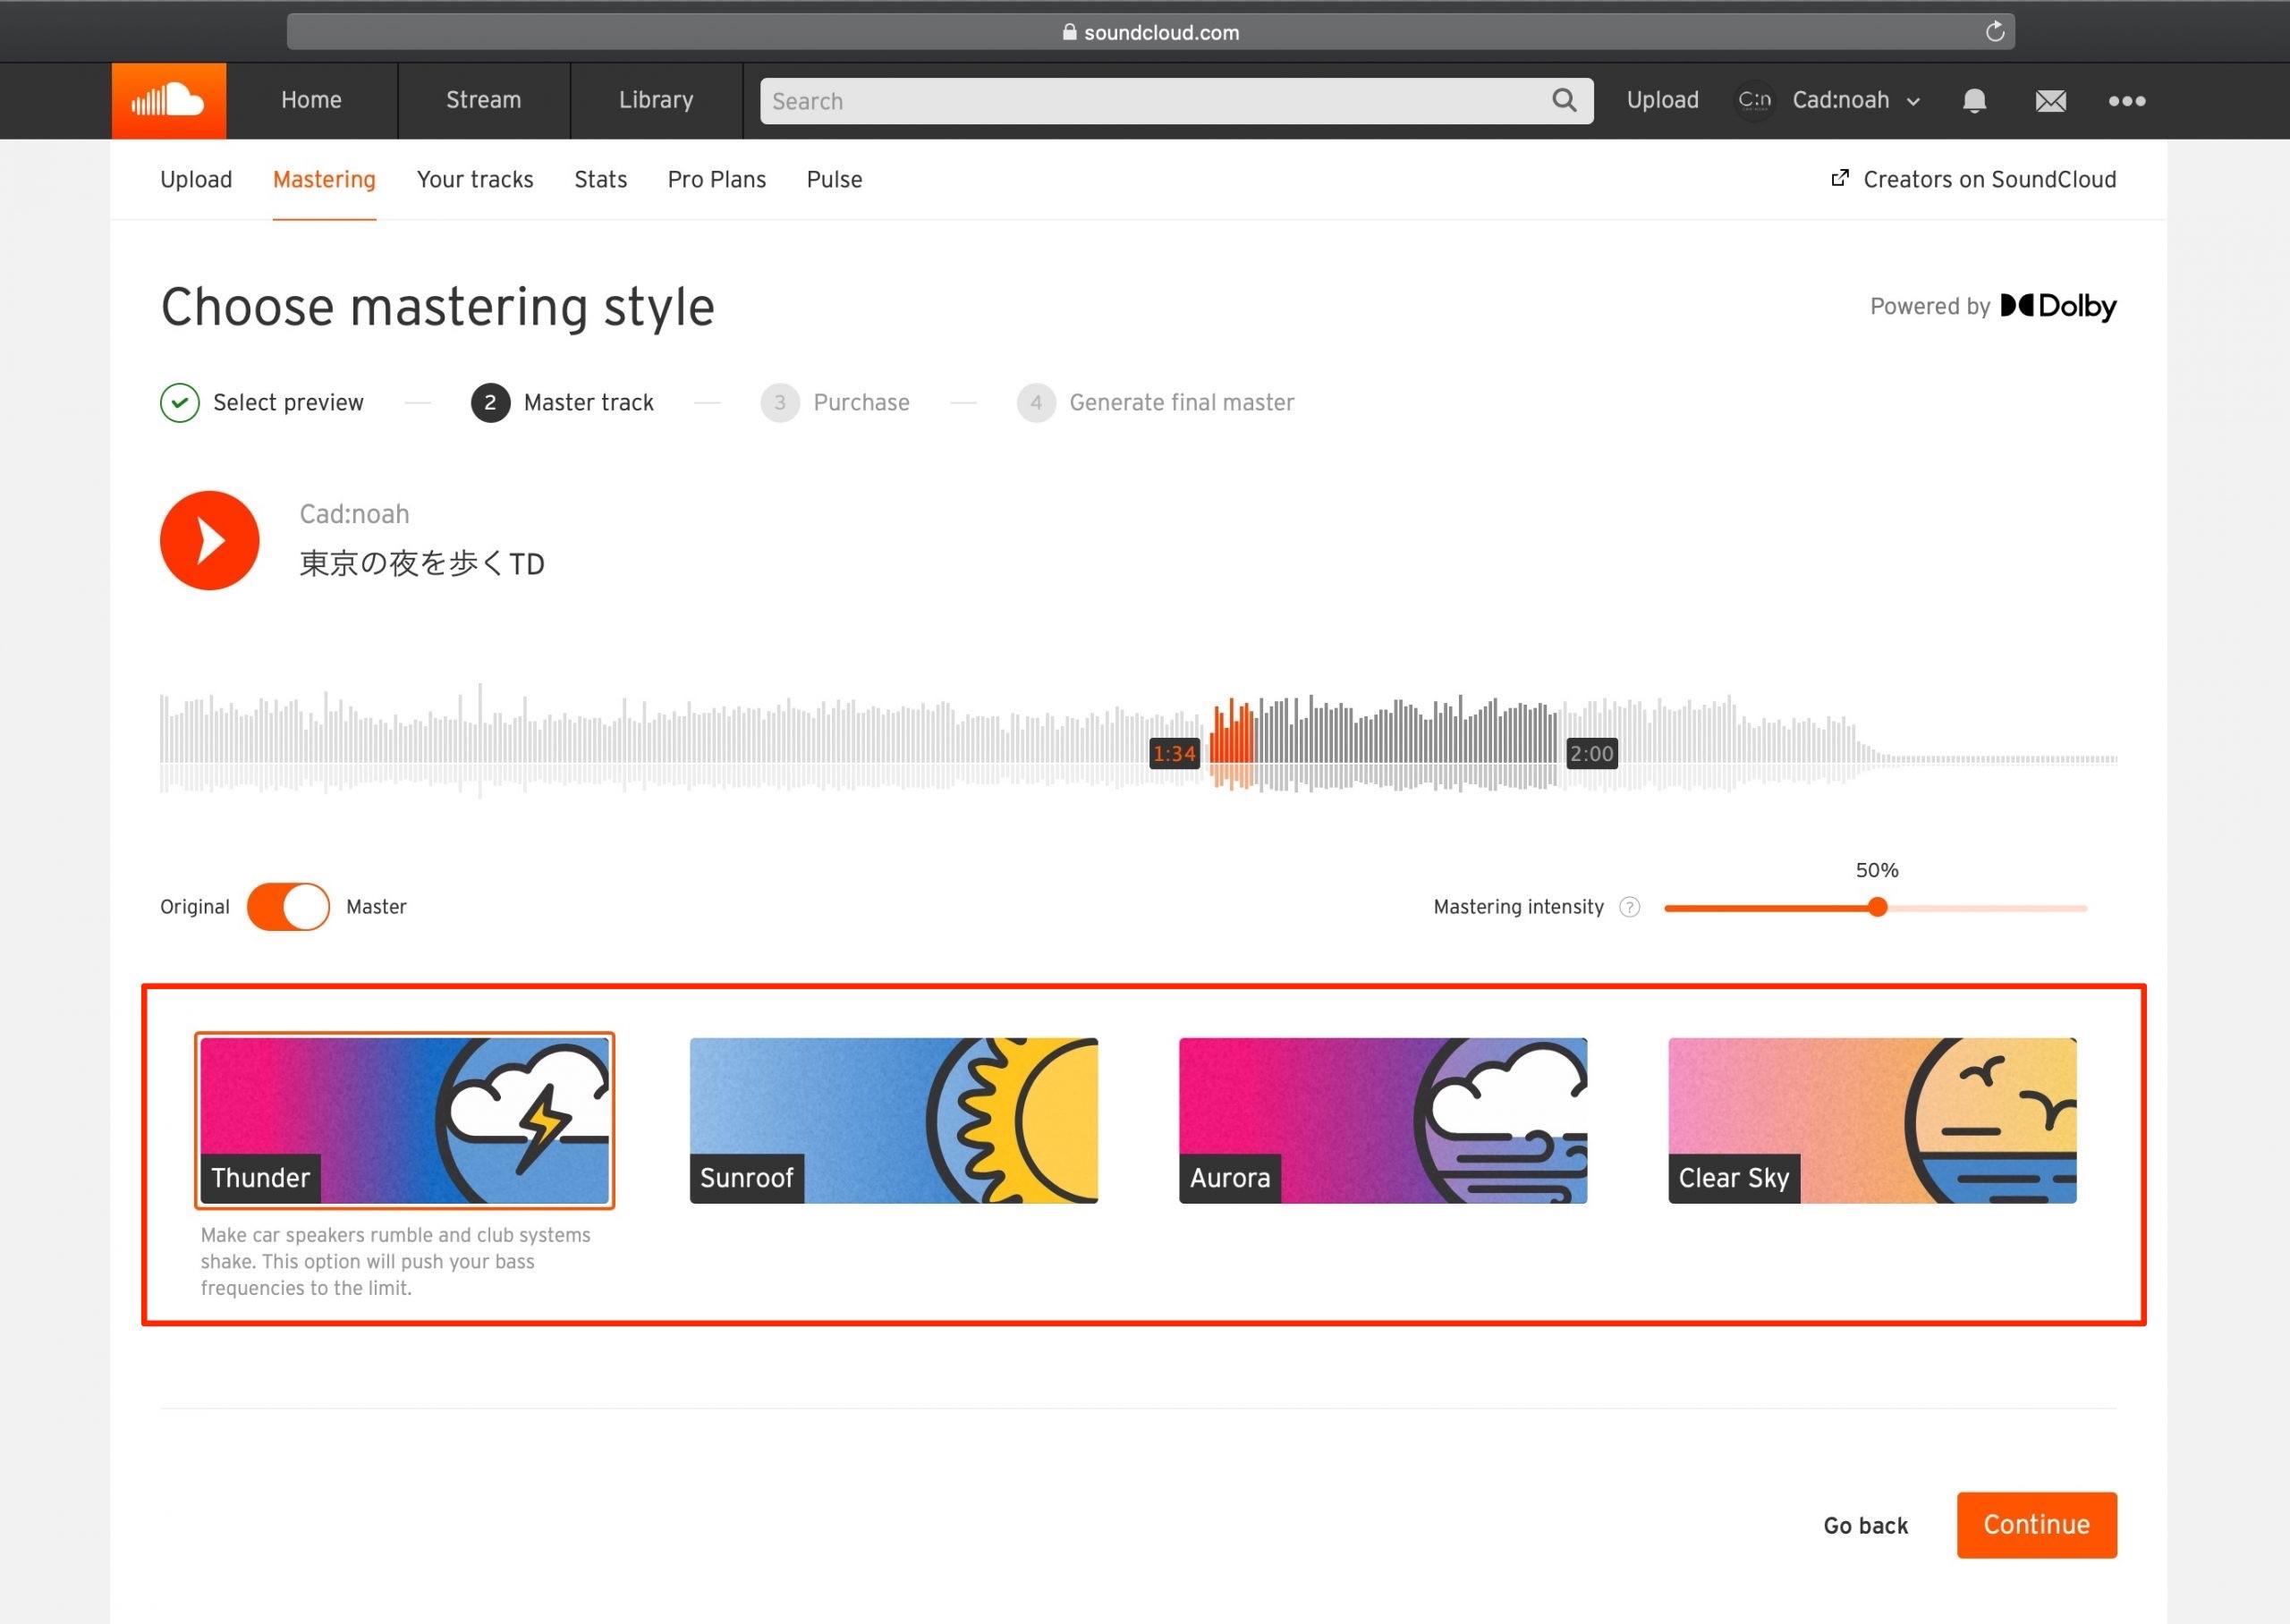 Mastring_Type